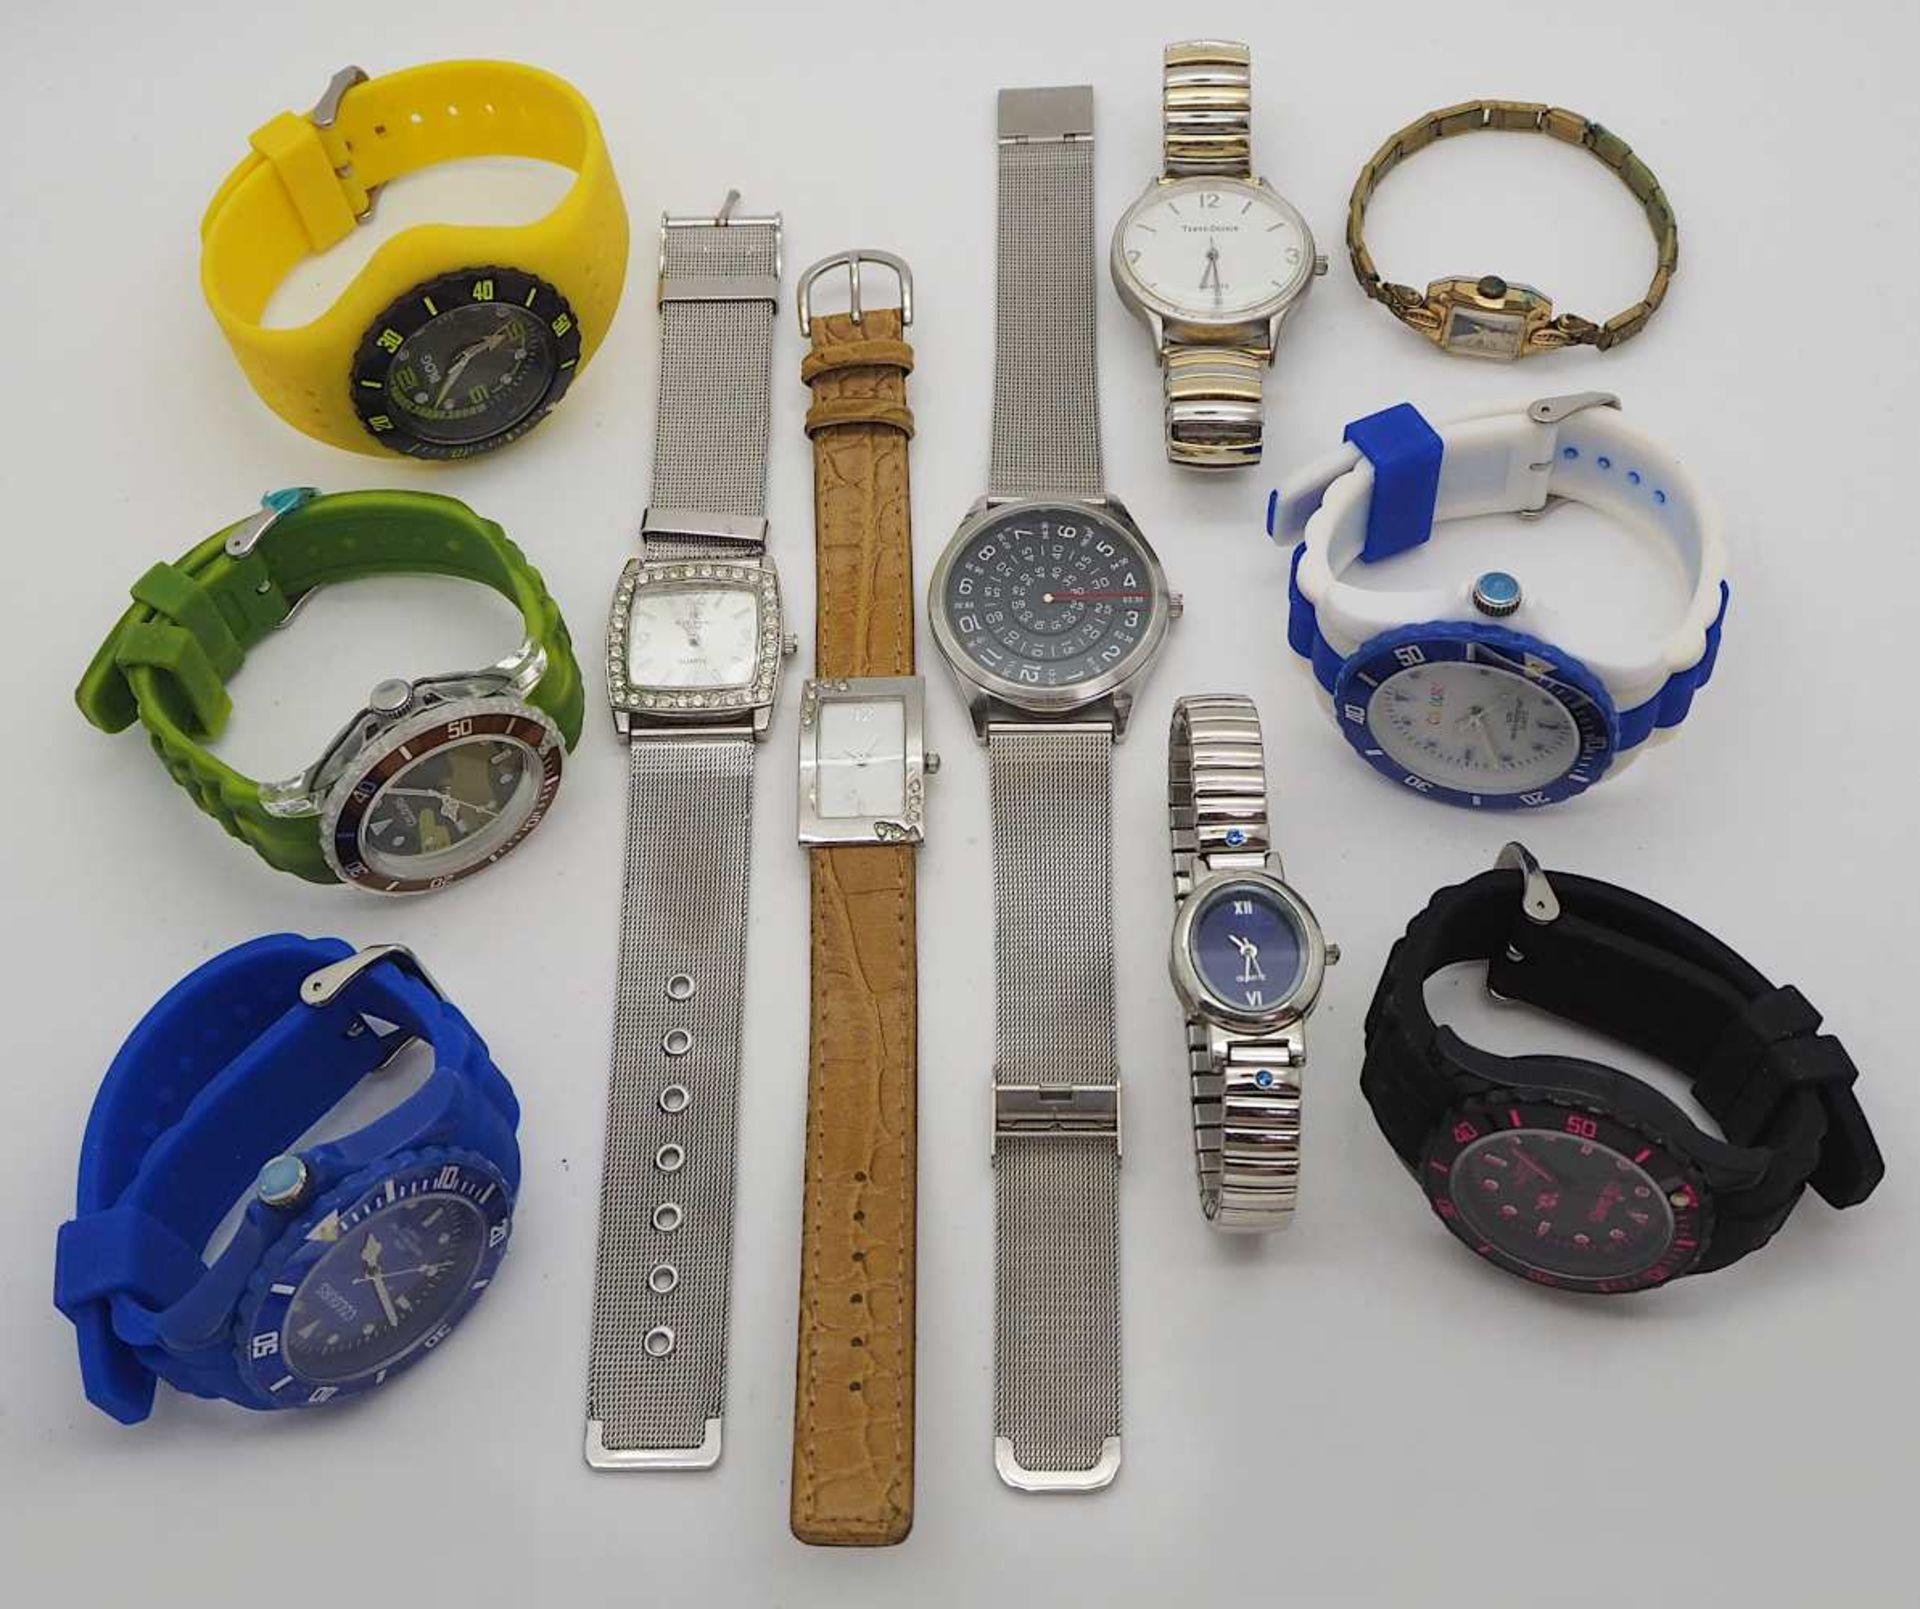 1 Konv. Armbanduhren Metall, Kunststoff, Leder Asp./ Gsp. - Bild 2 aus 2